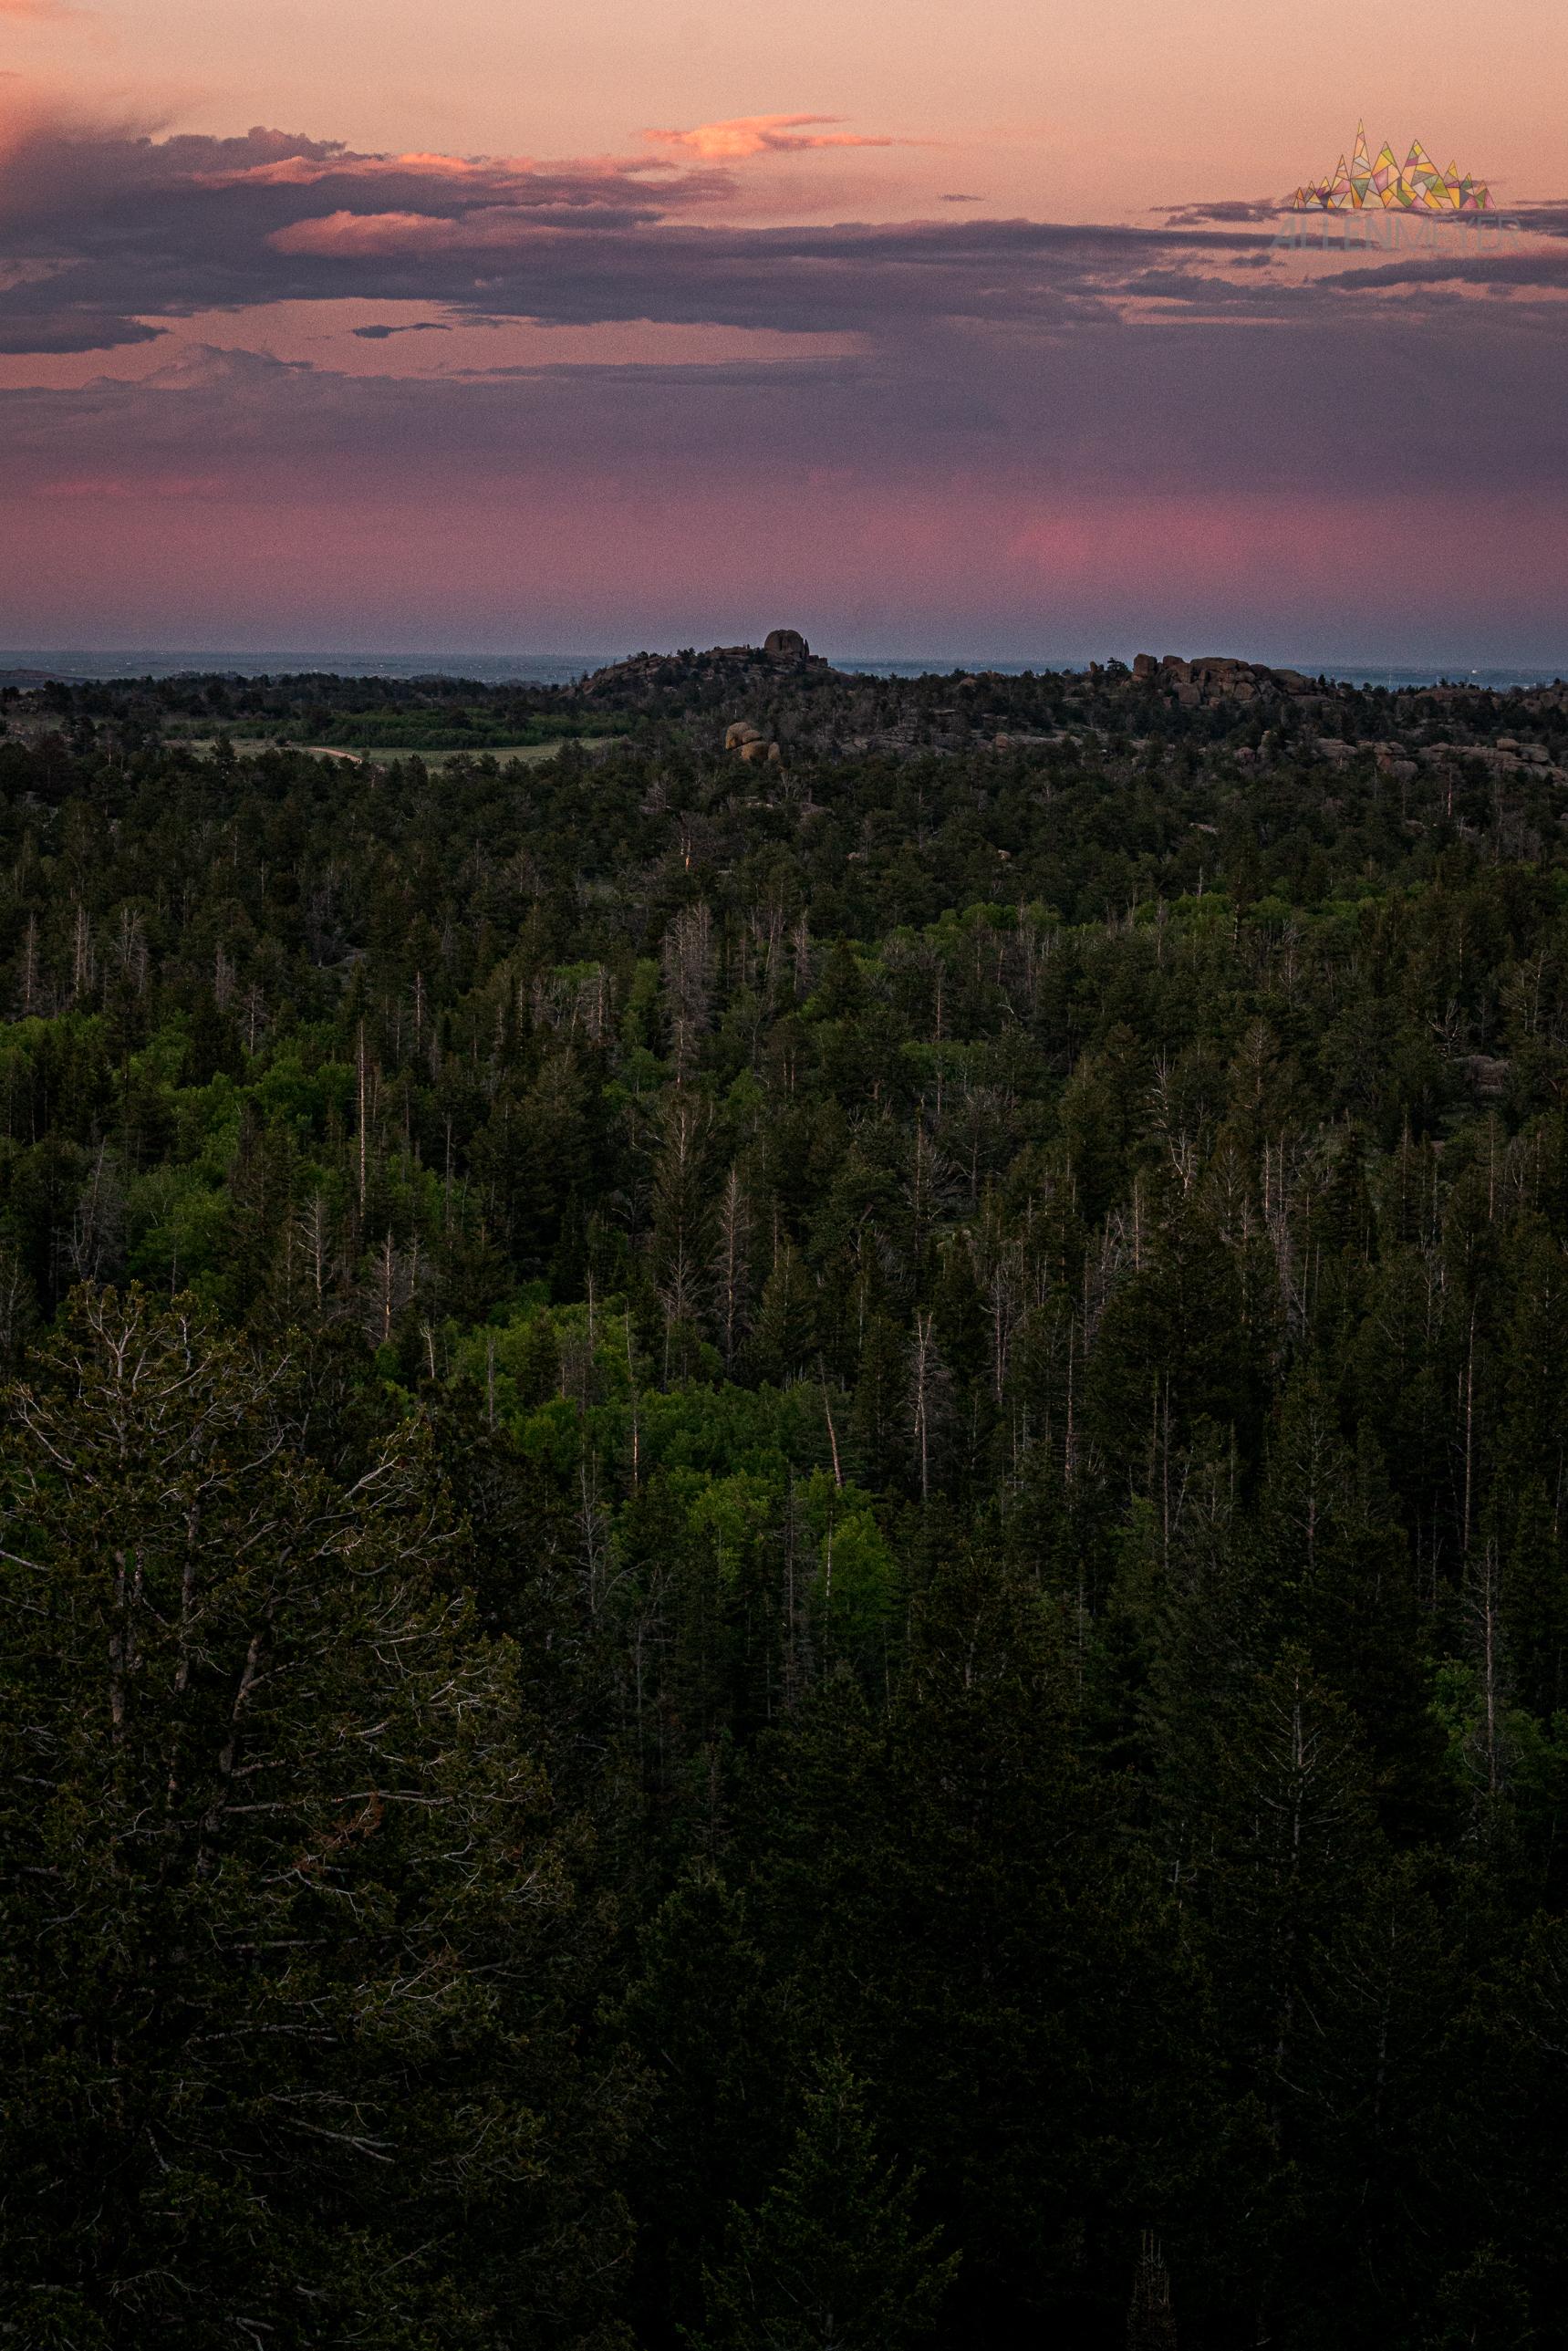 Outdoor Adventures In Cheyenne, Wyoming; Photography by Allen Meyer-05785.jpg